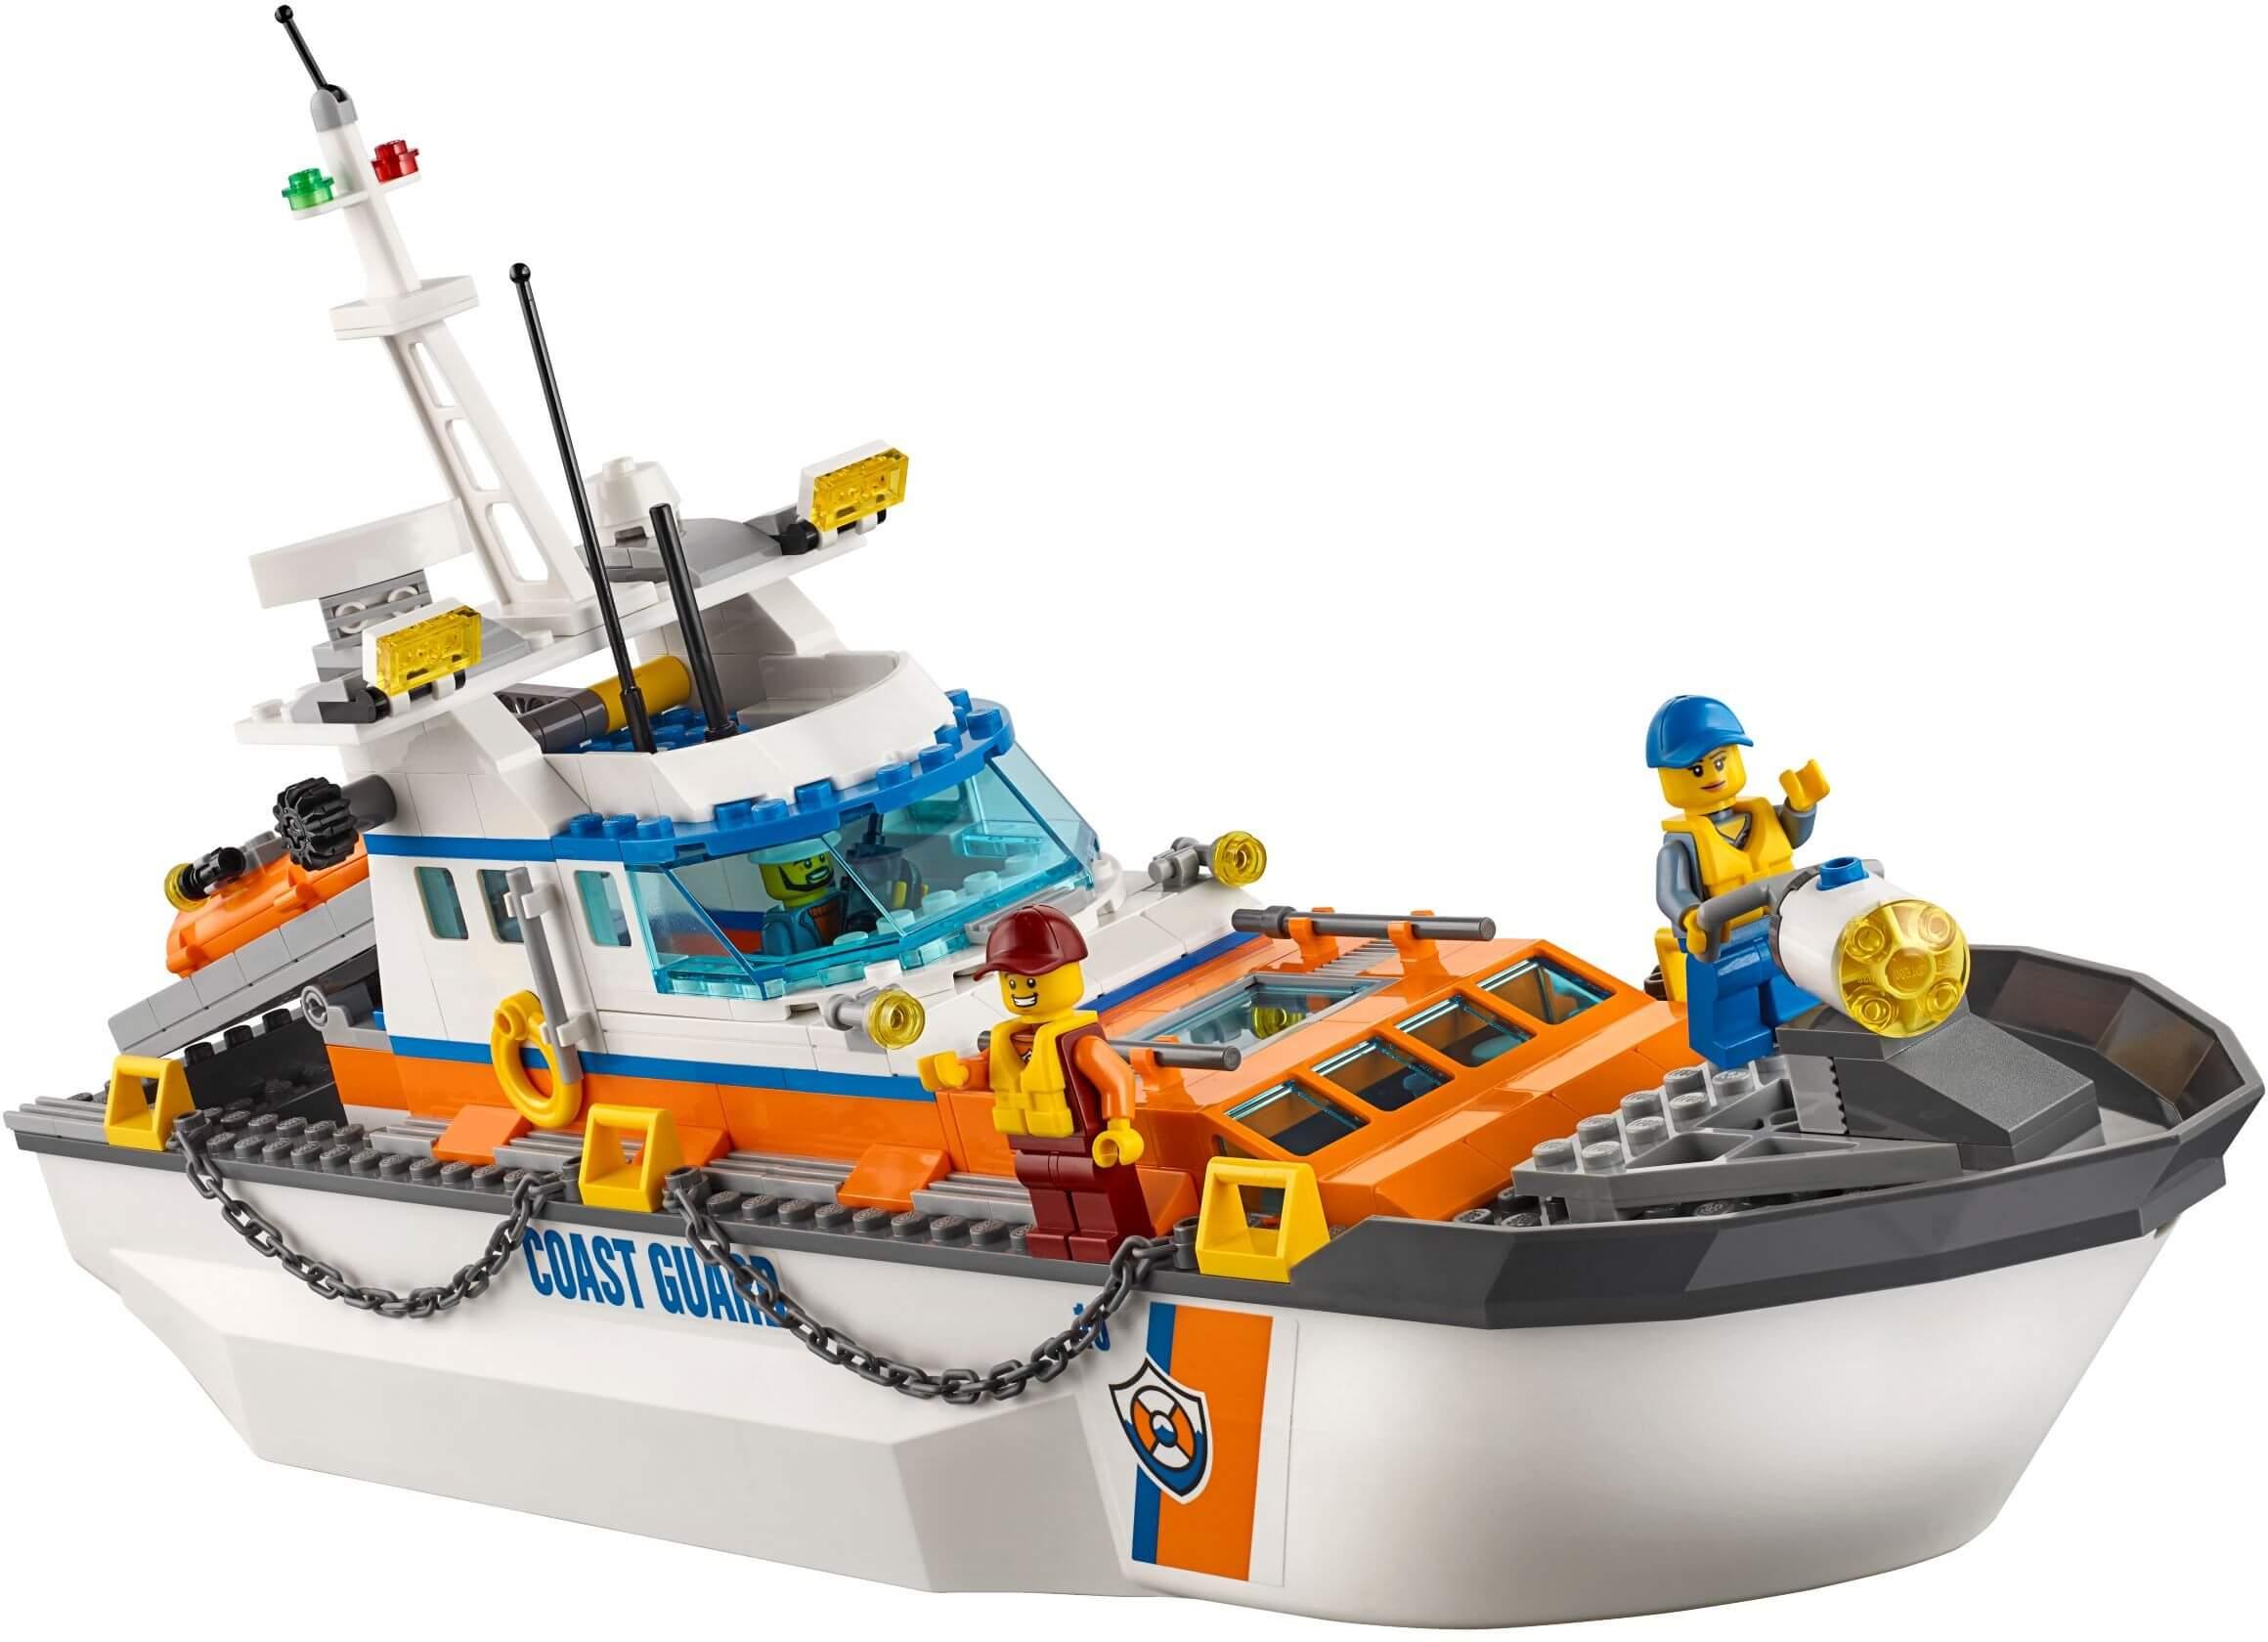 Mua đồ chơi LEGO 60167 - LEGO City 60167 - Sở Chỉ Huy bảo vệ Bờ Biển (LEGO City Coast Guard Head Quarters)